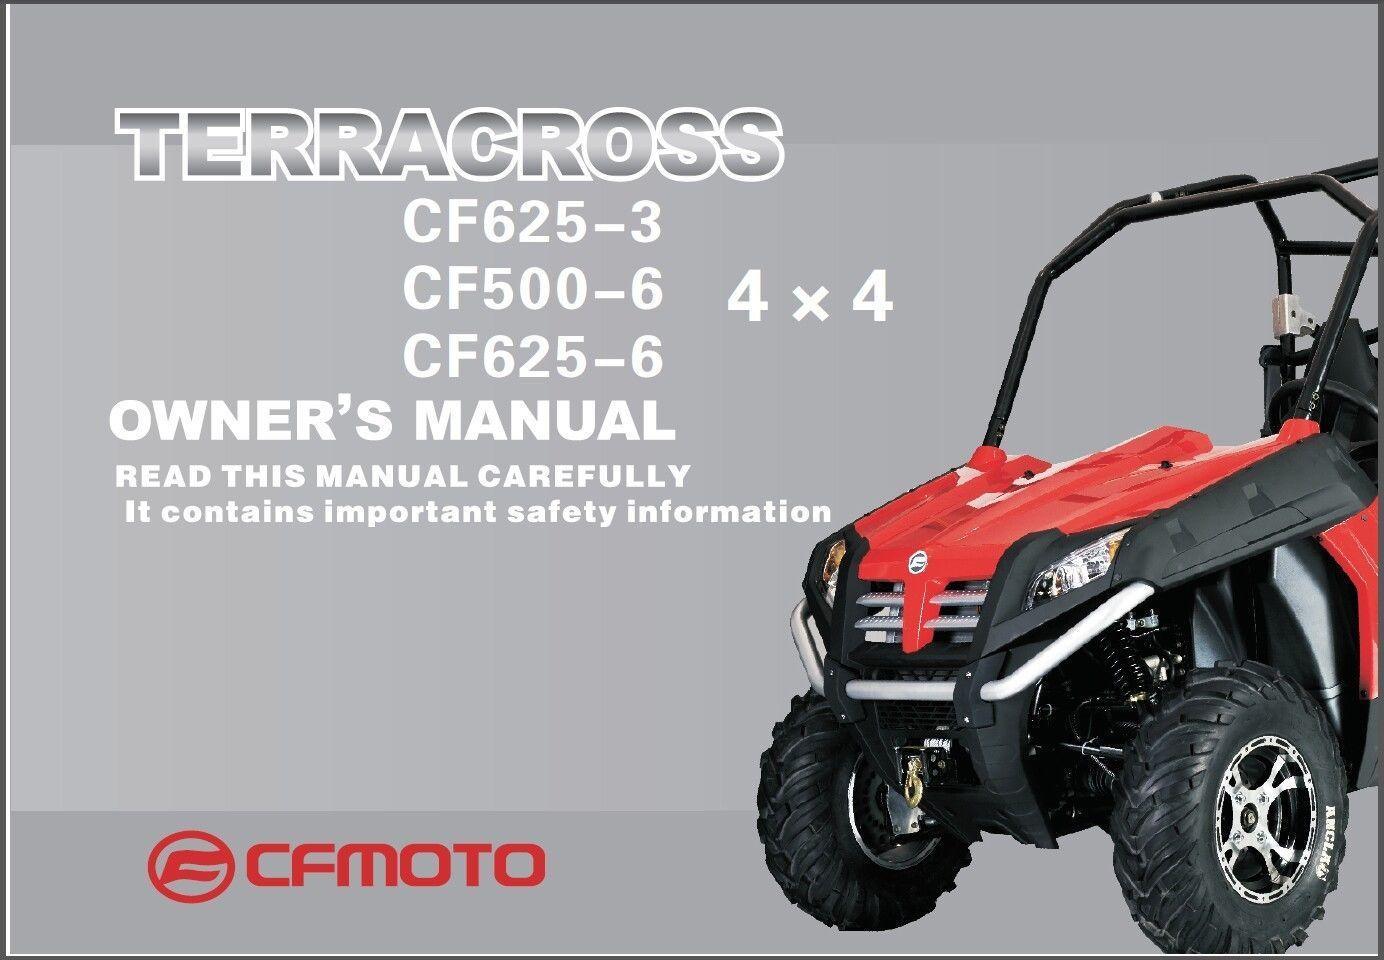 CFMoto Terracross Z6 Z6EX Z5 CF625-3 CF625-6 CF500-6 Service Repair Manual  CD For Sale - Item #1445669